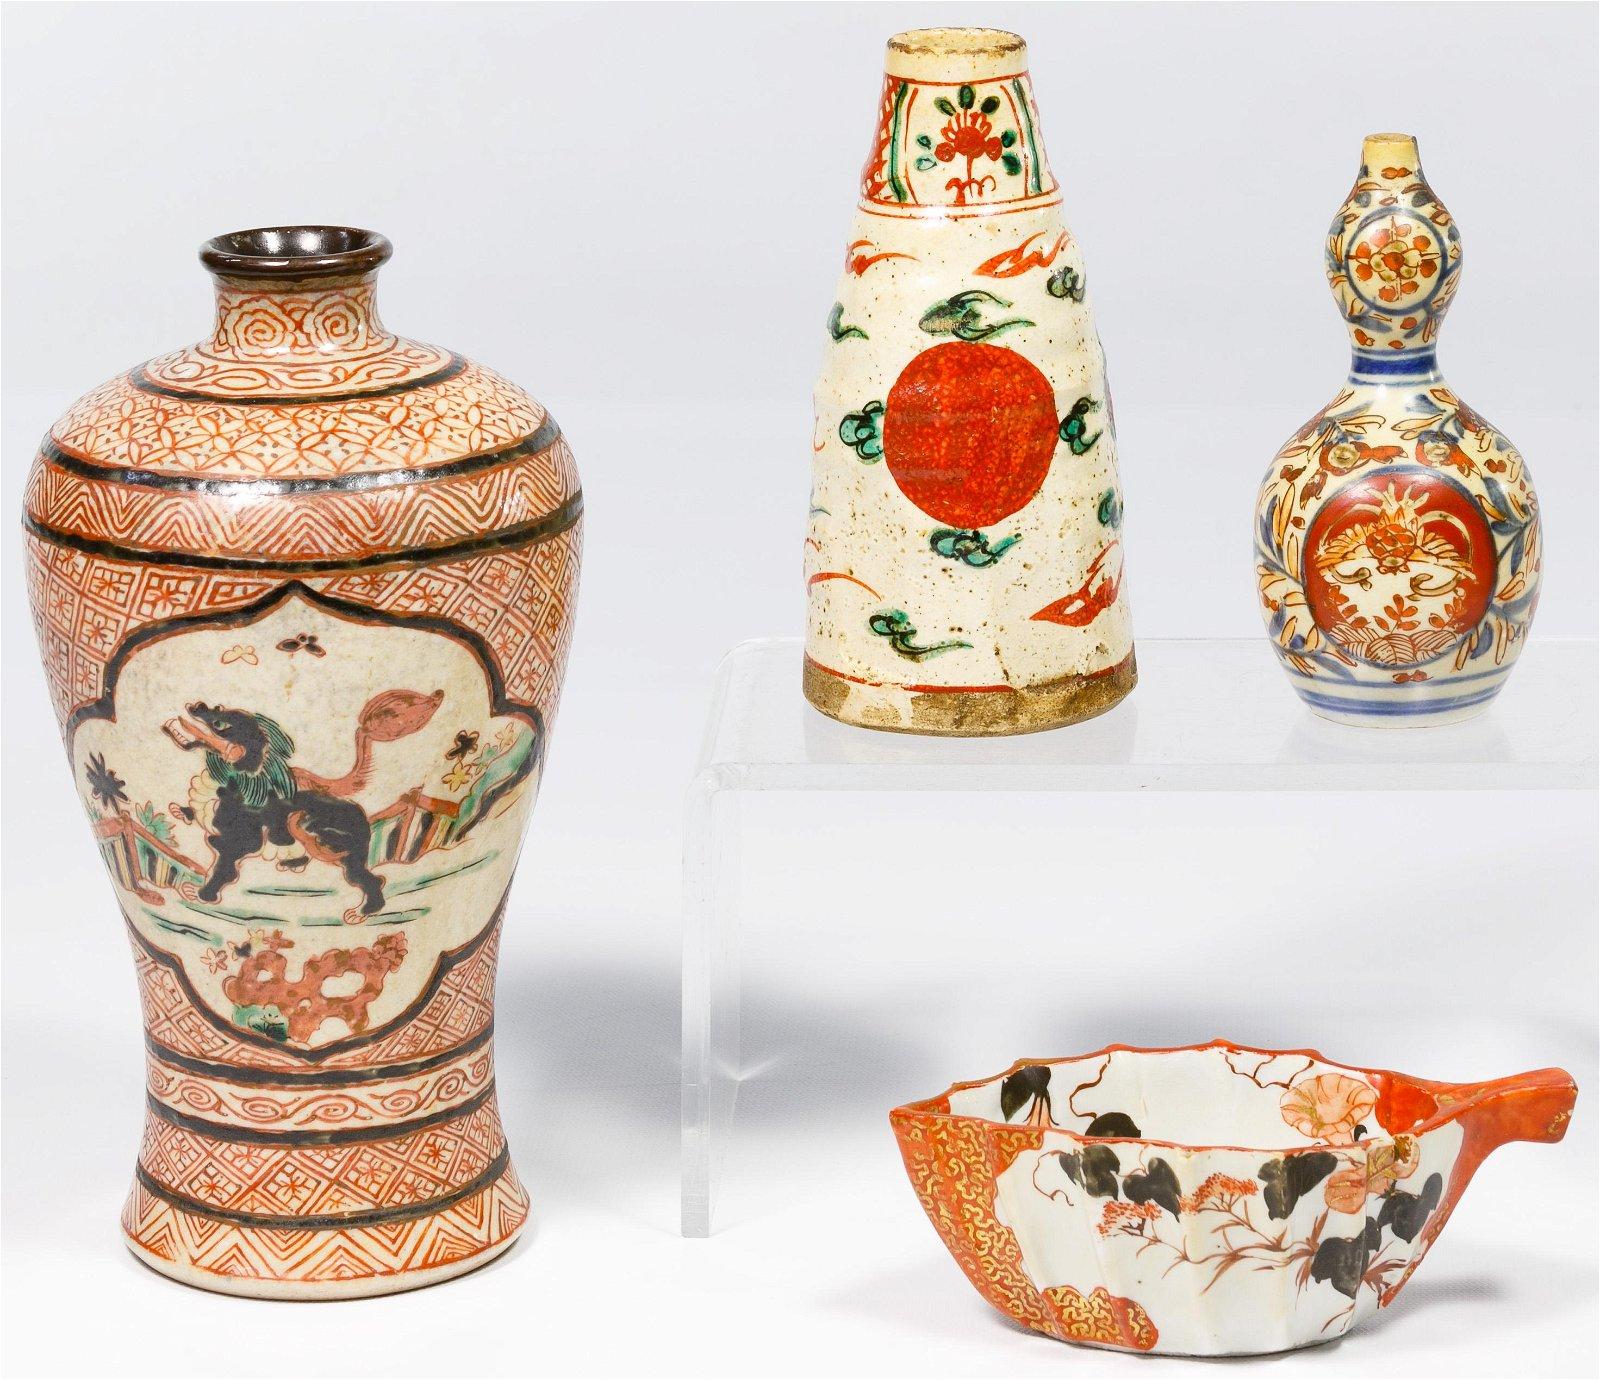 Japanese 'Imari' Pottery Assortment